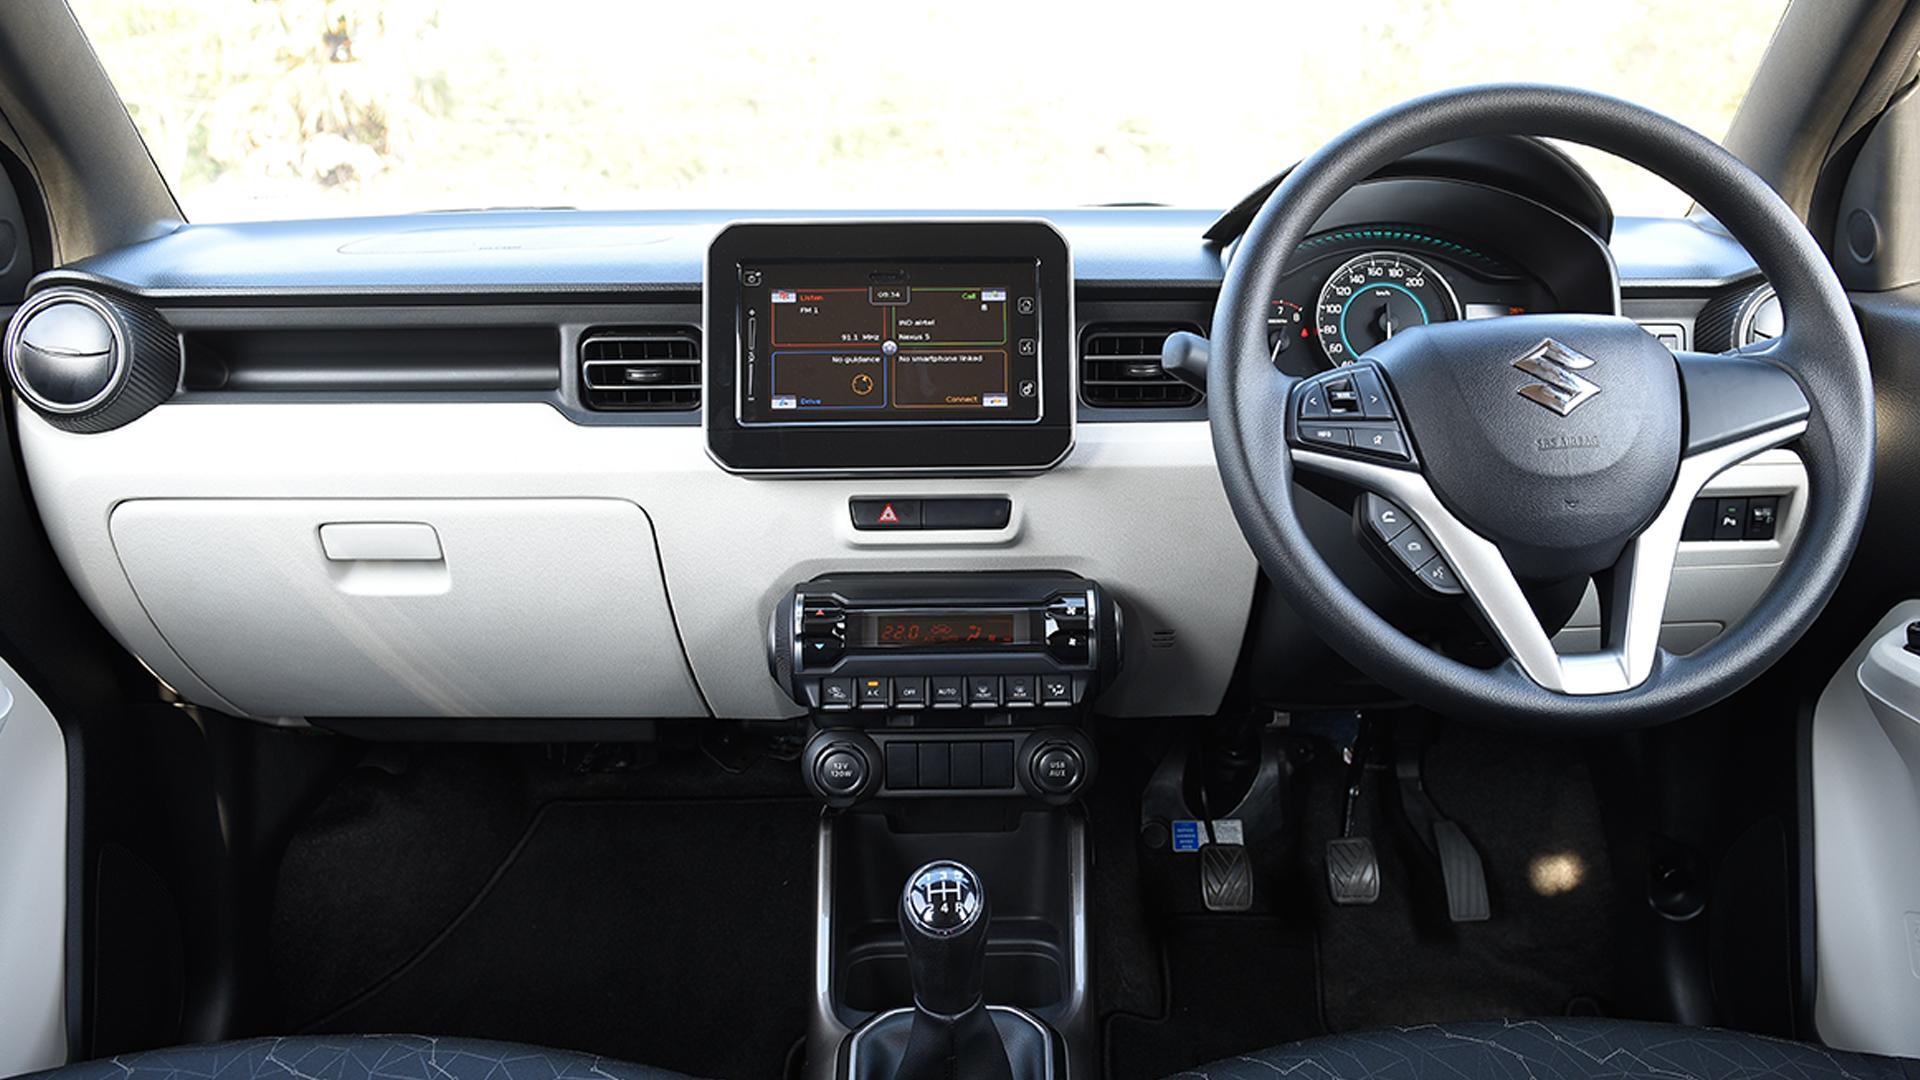 maruti suzuki ignis 2017 alpha petrol interior car photos. Black Bedroom Furniture Sets. Home Design Ideas